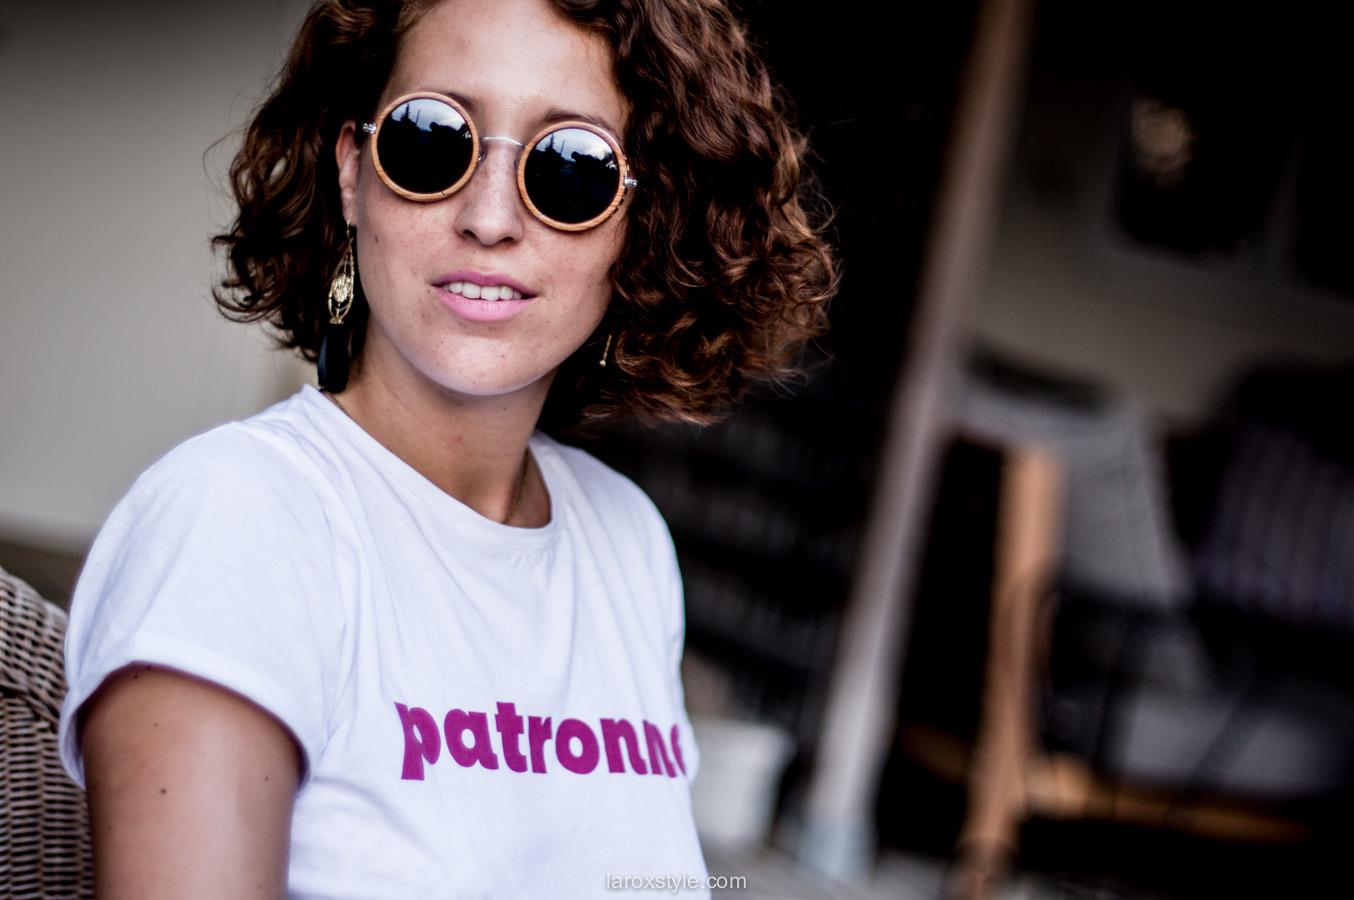 be a boss - girl Boss - patronne - blog mode et lifestyle lyon-13